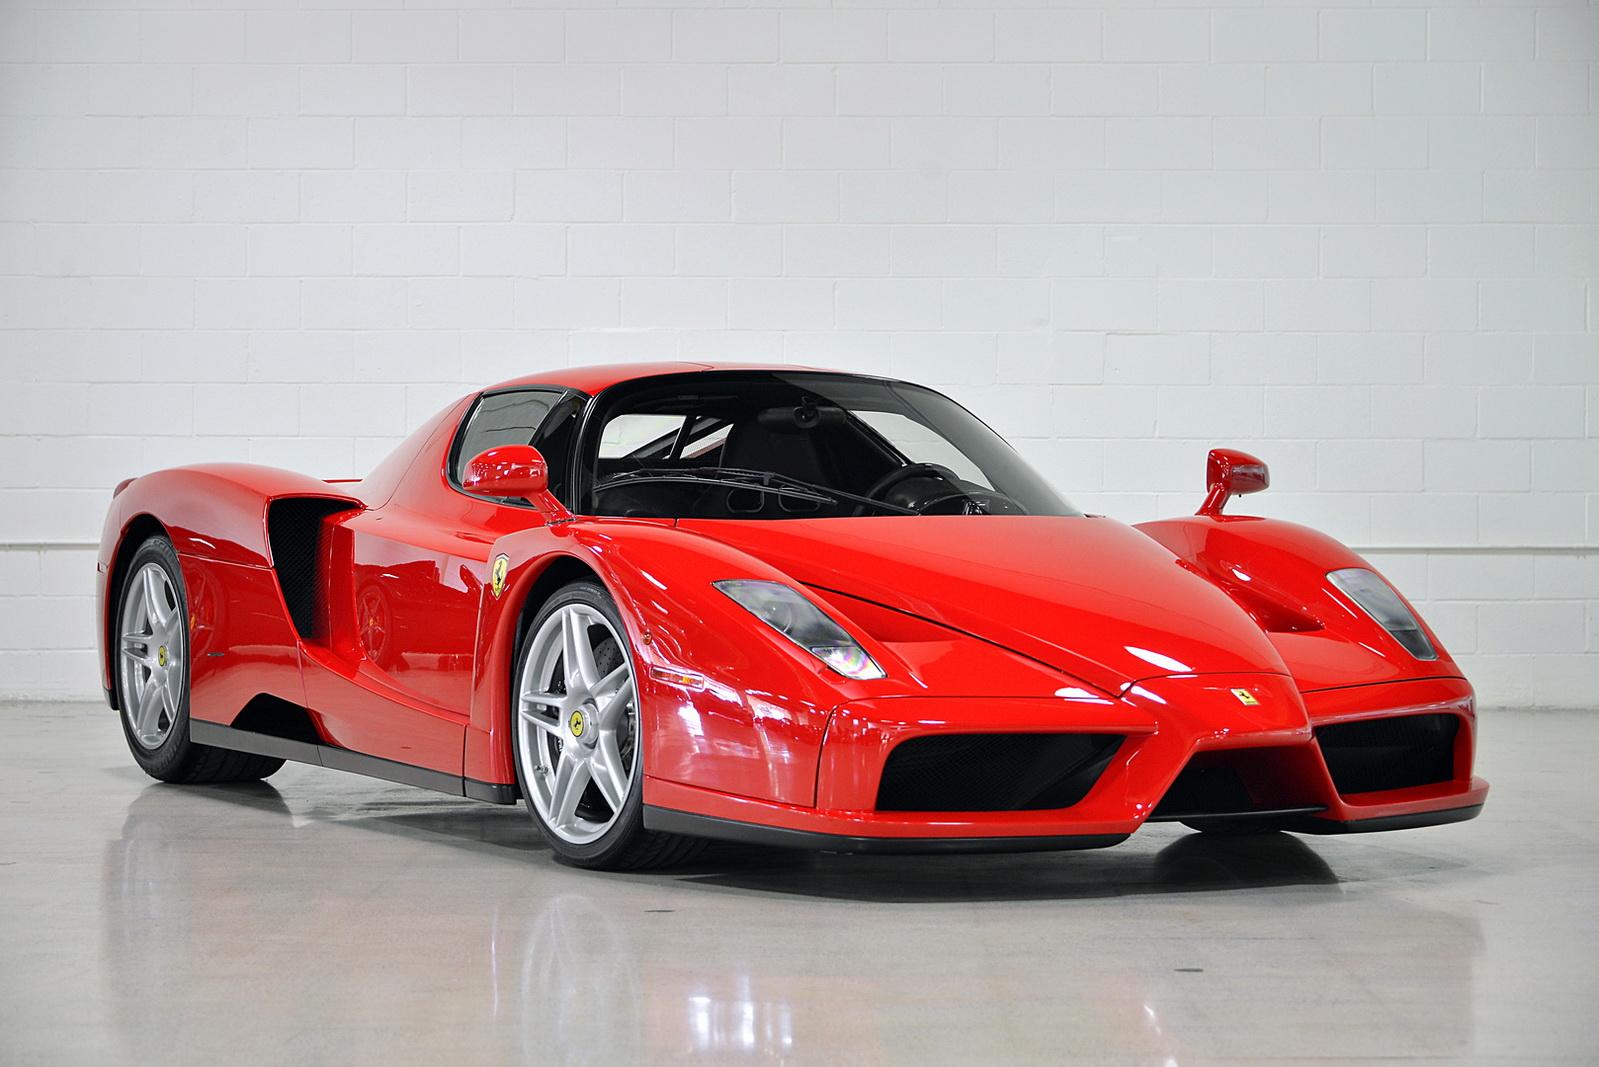 31 Ferrari Pdf Manuals Download For Free